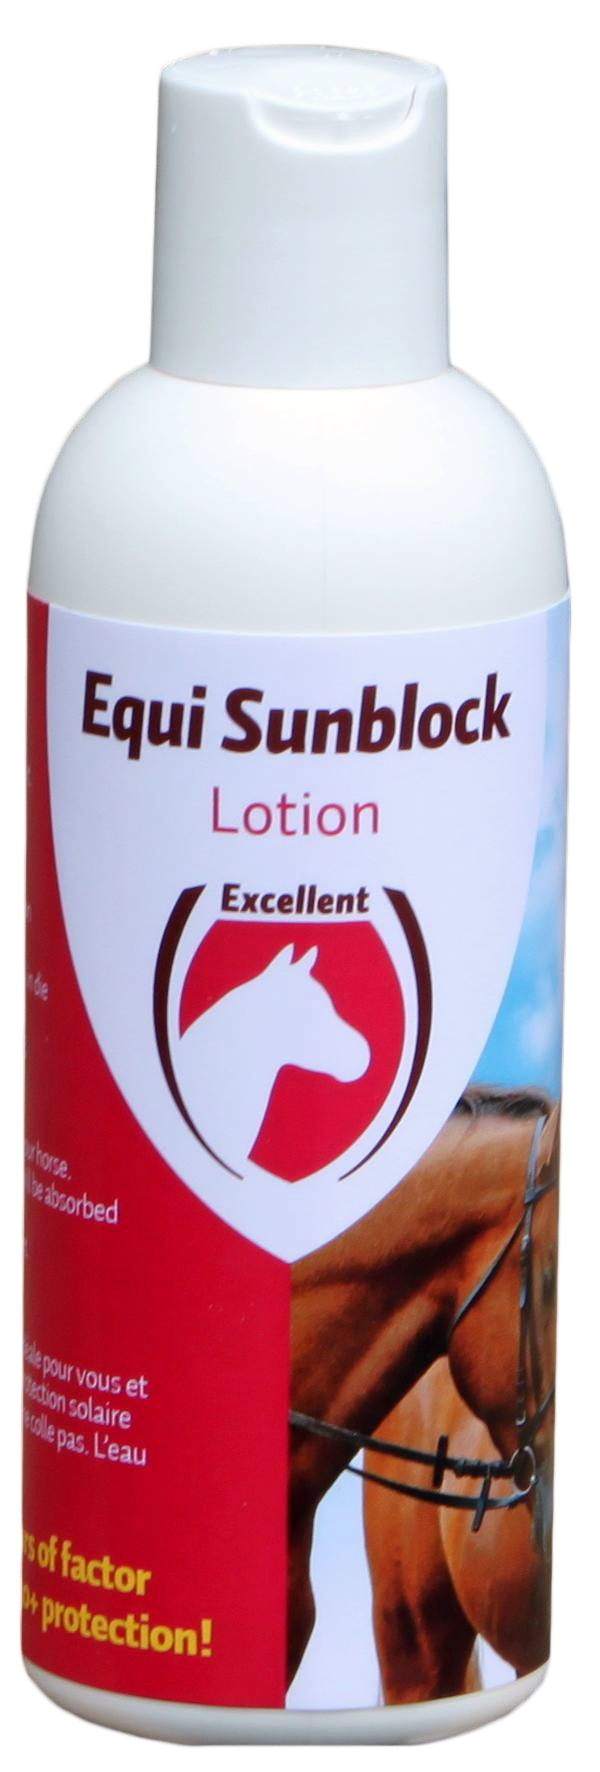 Equi Sunblock lotion